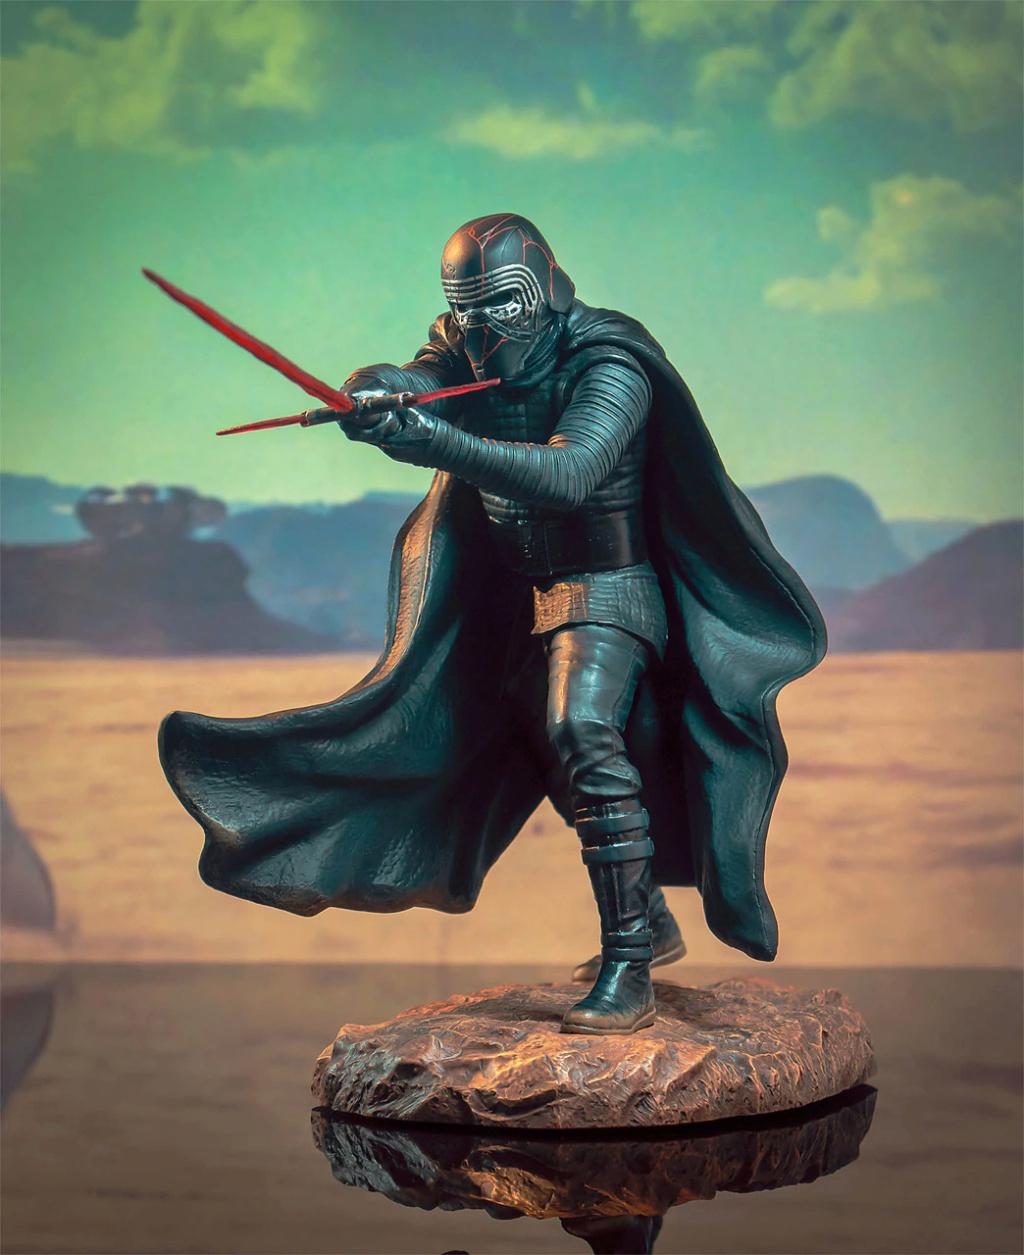 Kylo Ren Rise of Skywalker Premier Collection 1:7 Statue DST 01_her10